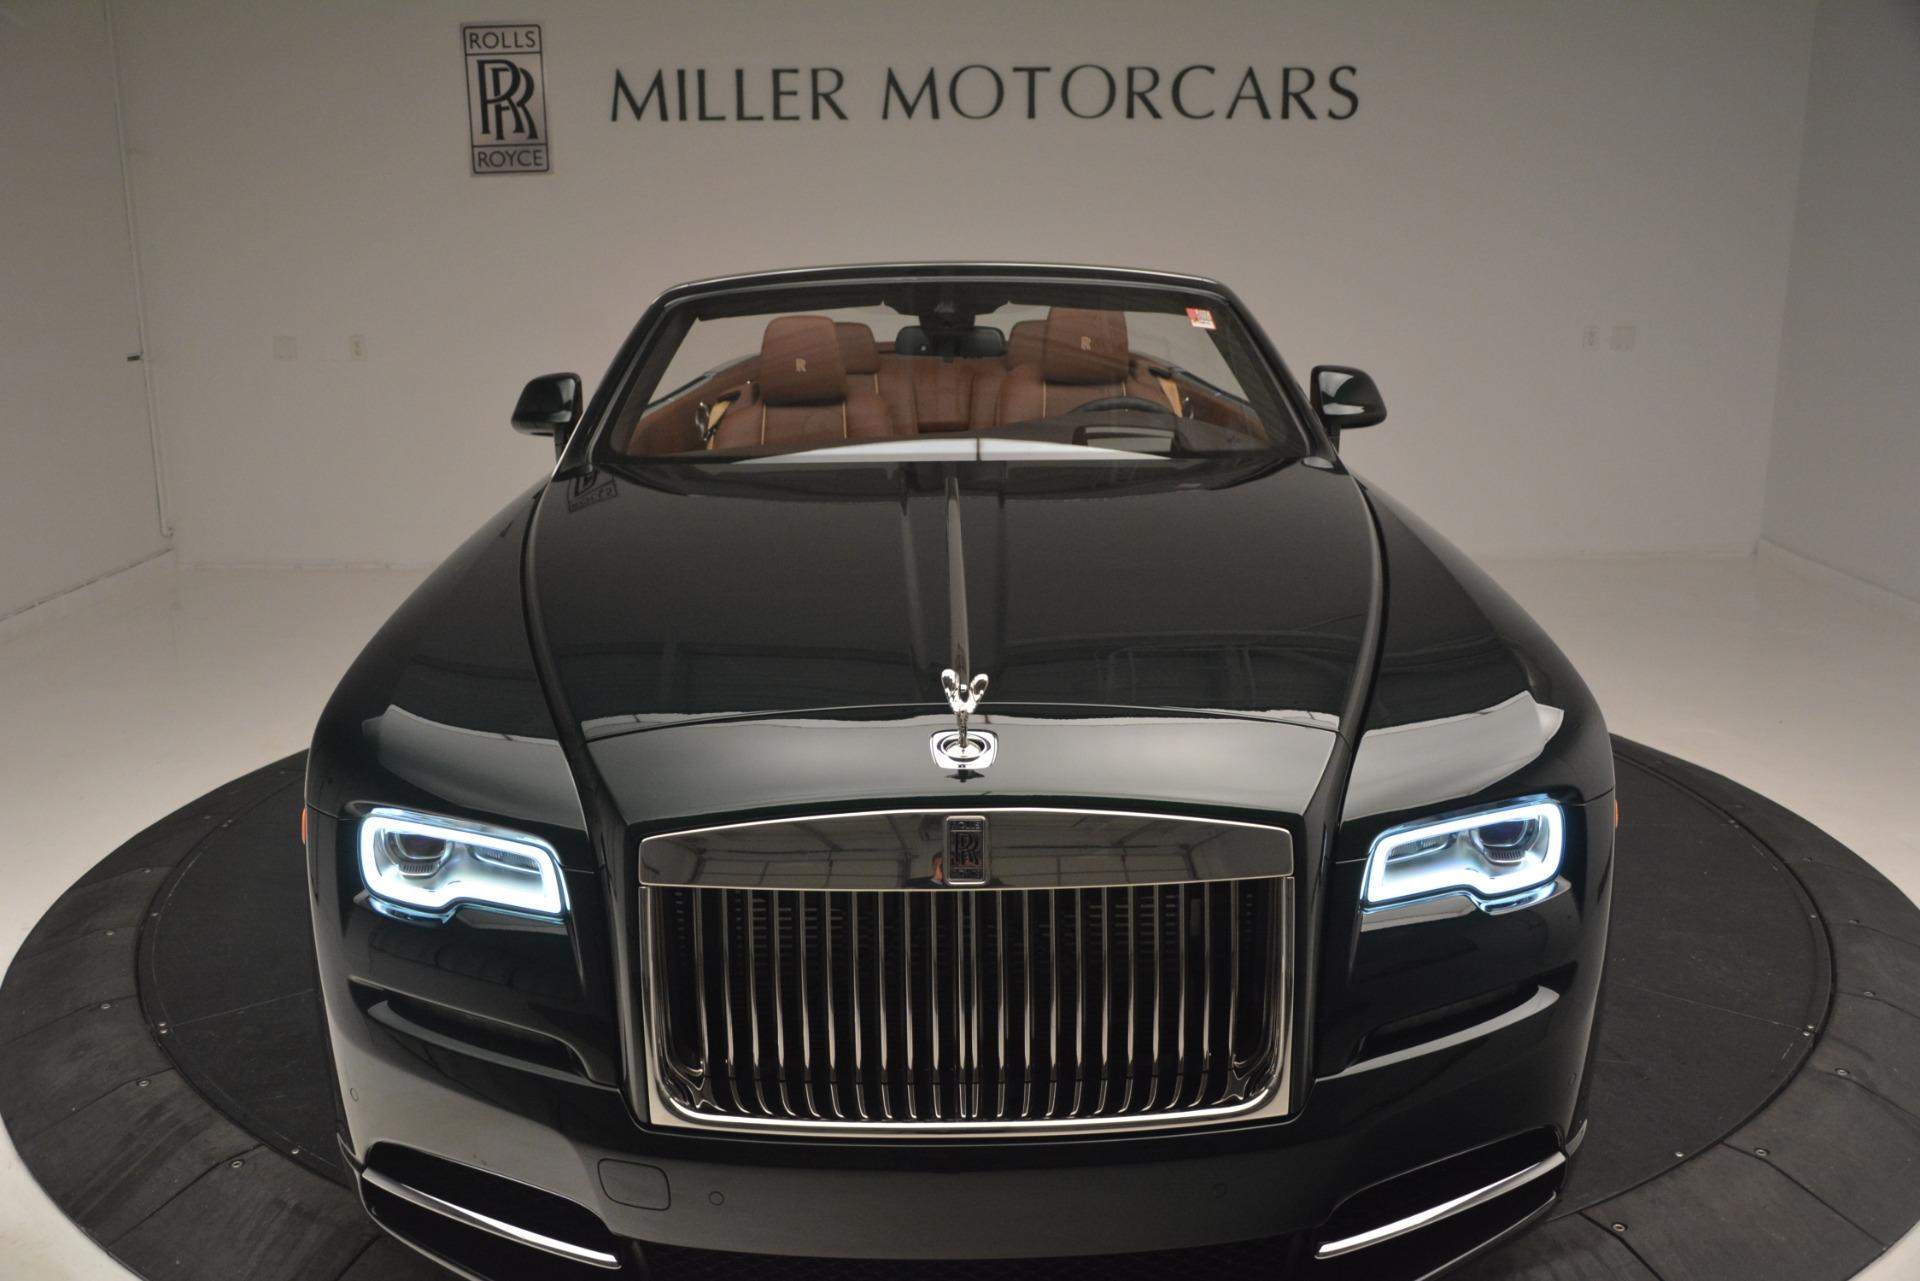 New 2019 Rolls-Royce Dawn  For Sale In Greenwich, CT 2722_p53